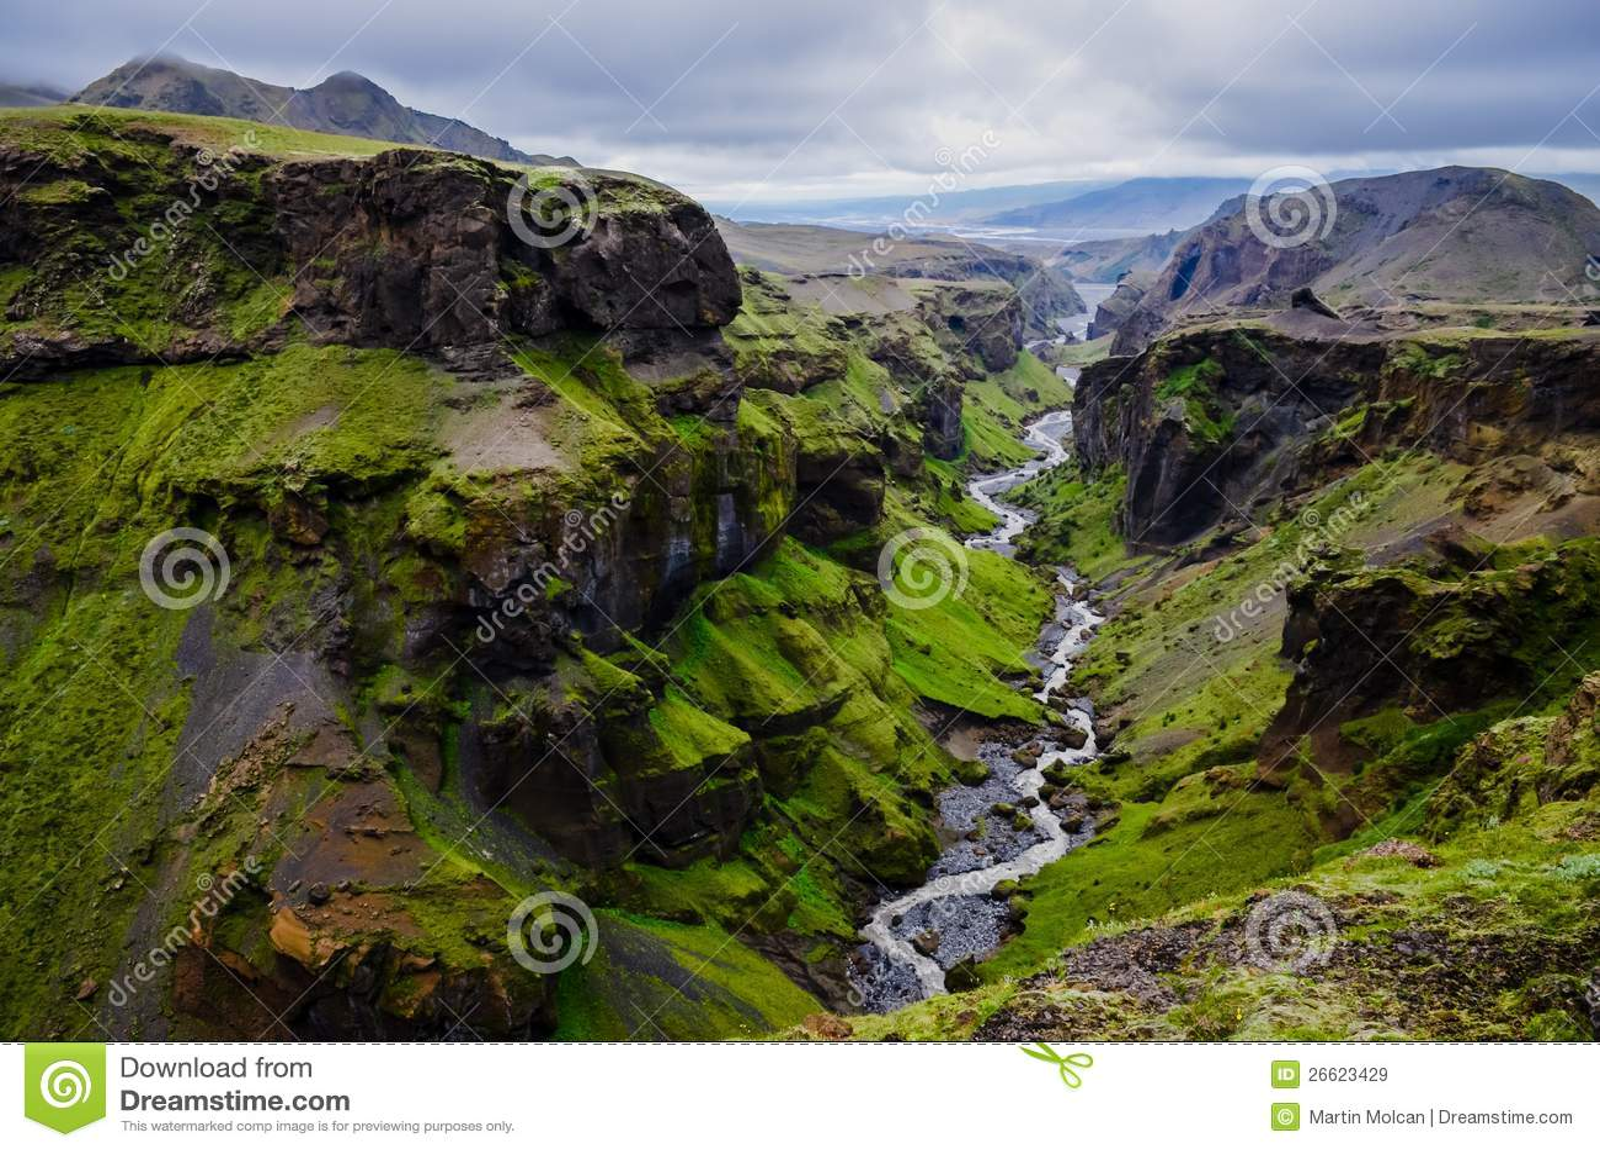 Thorsmork Mountains Canyon And River Near Skogar Royalty